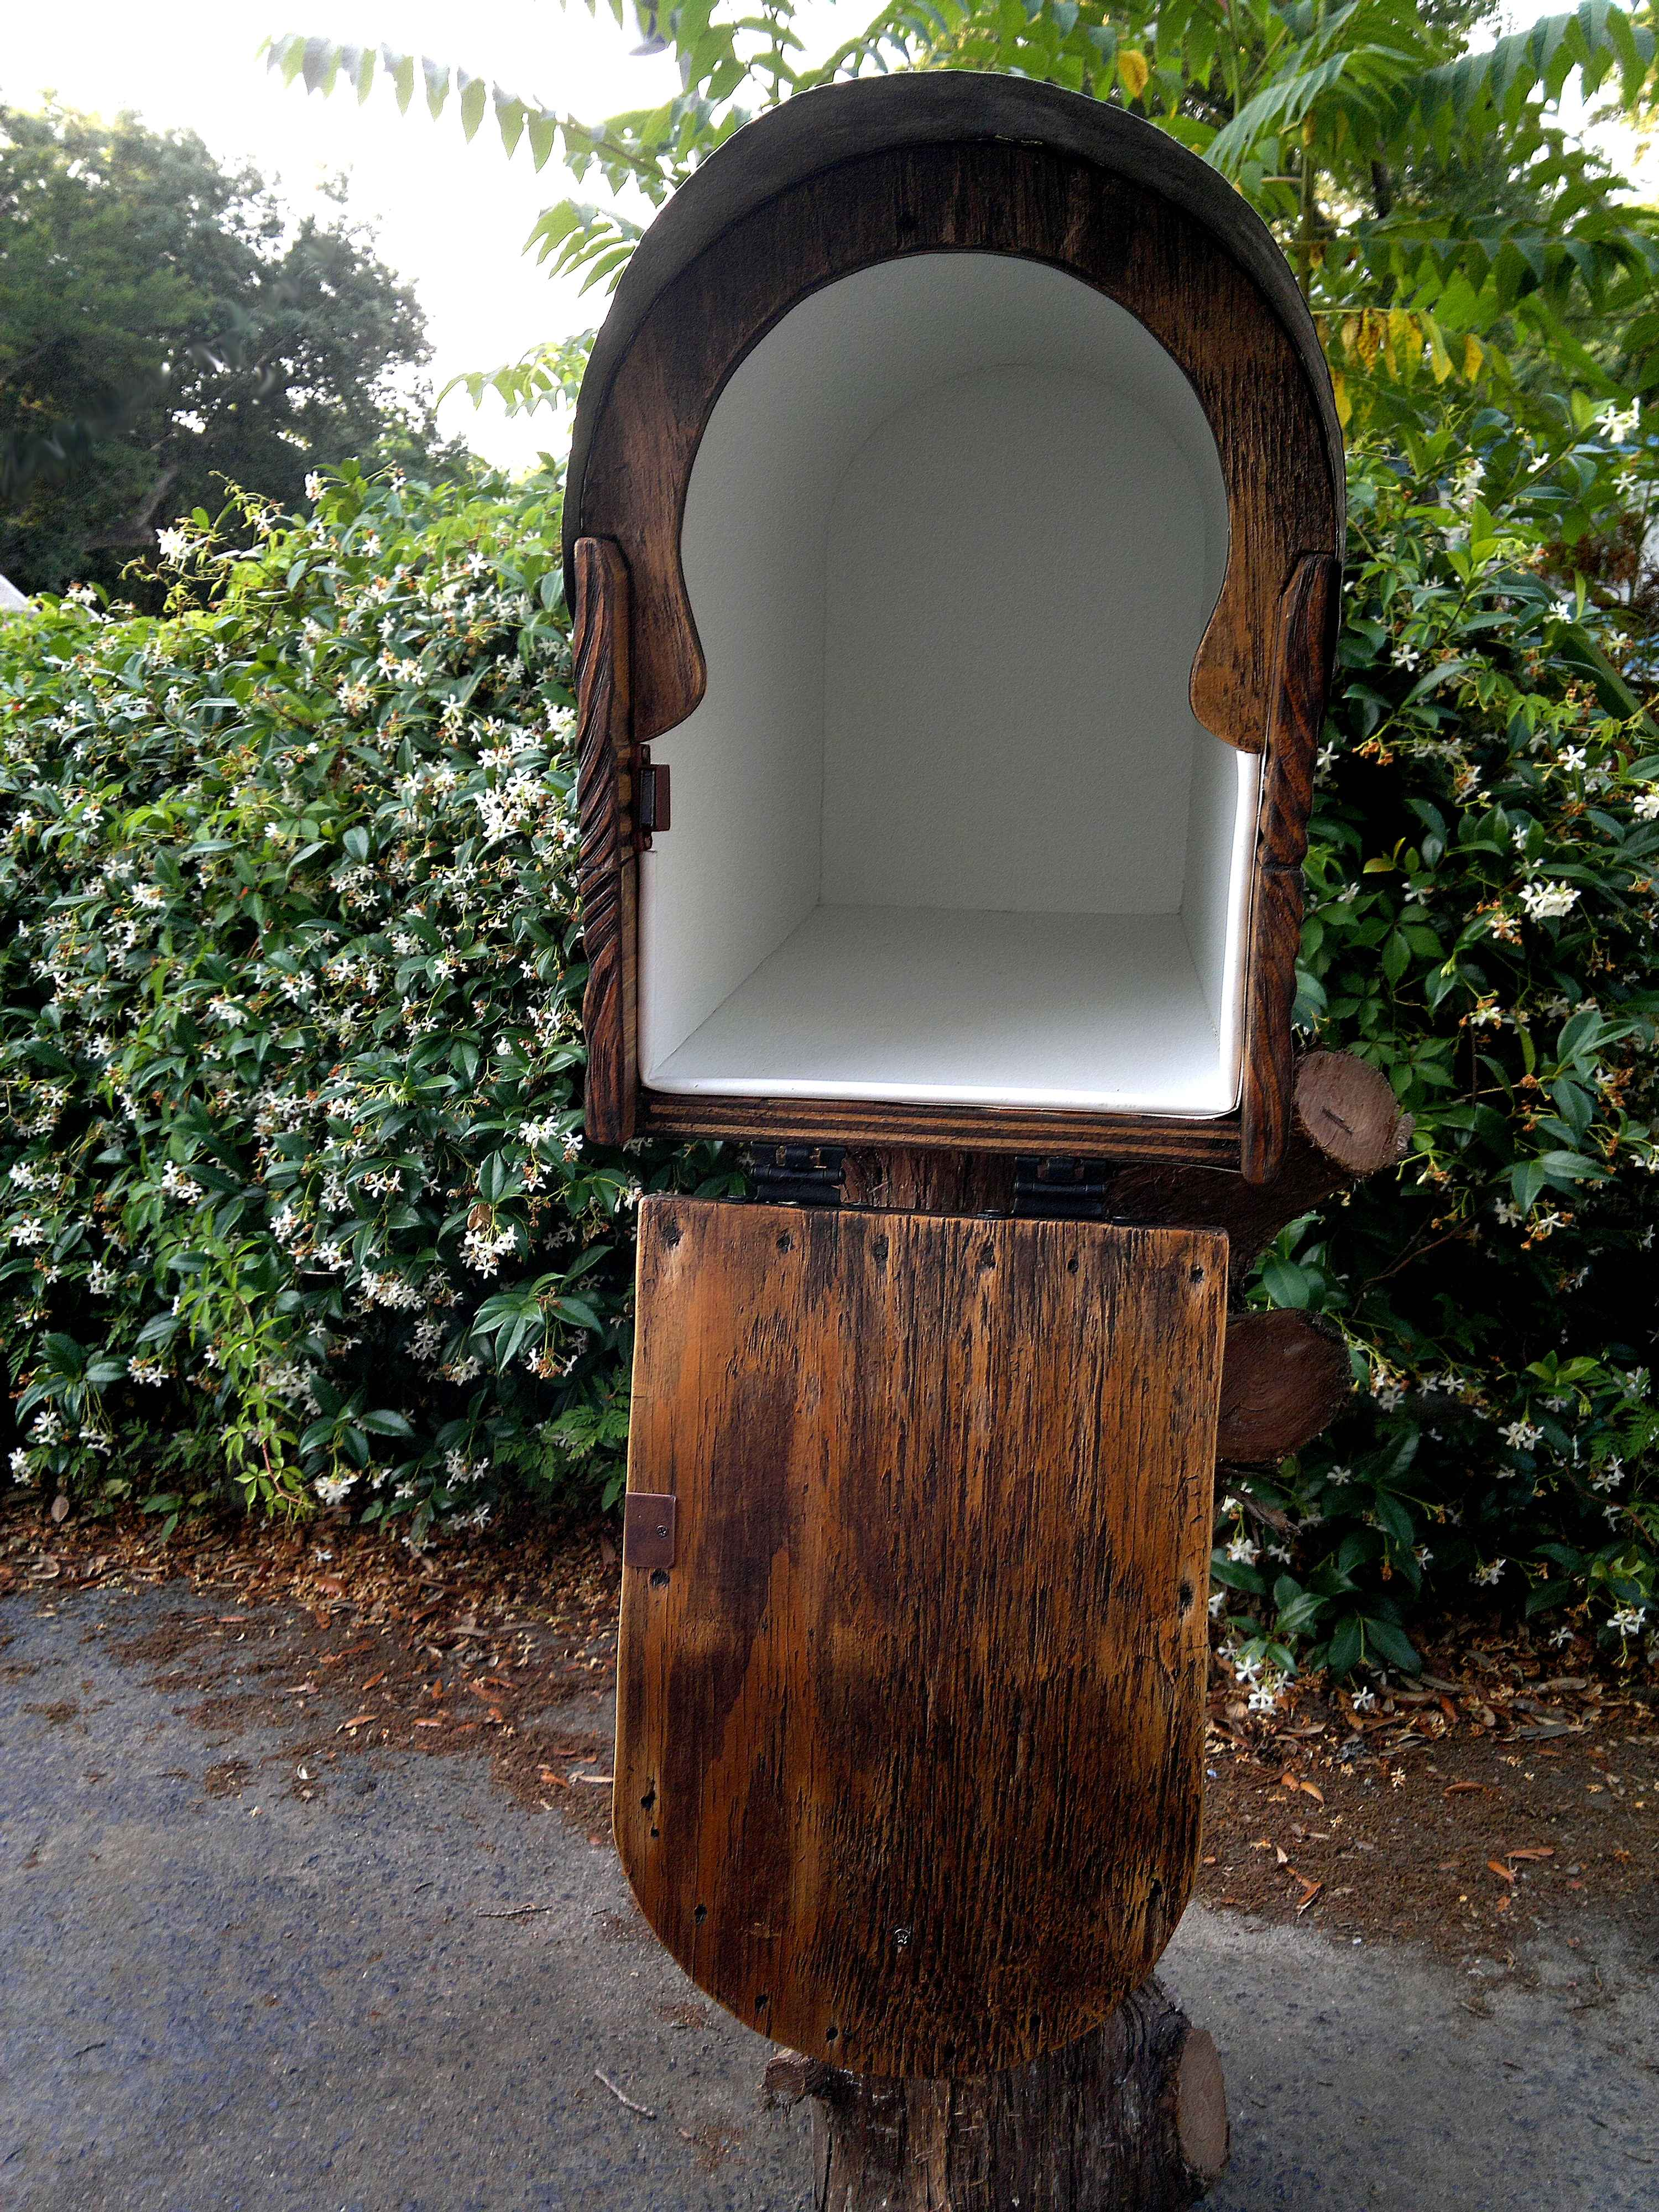 Rustic mailbox. Inside